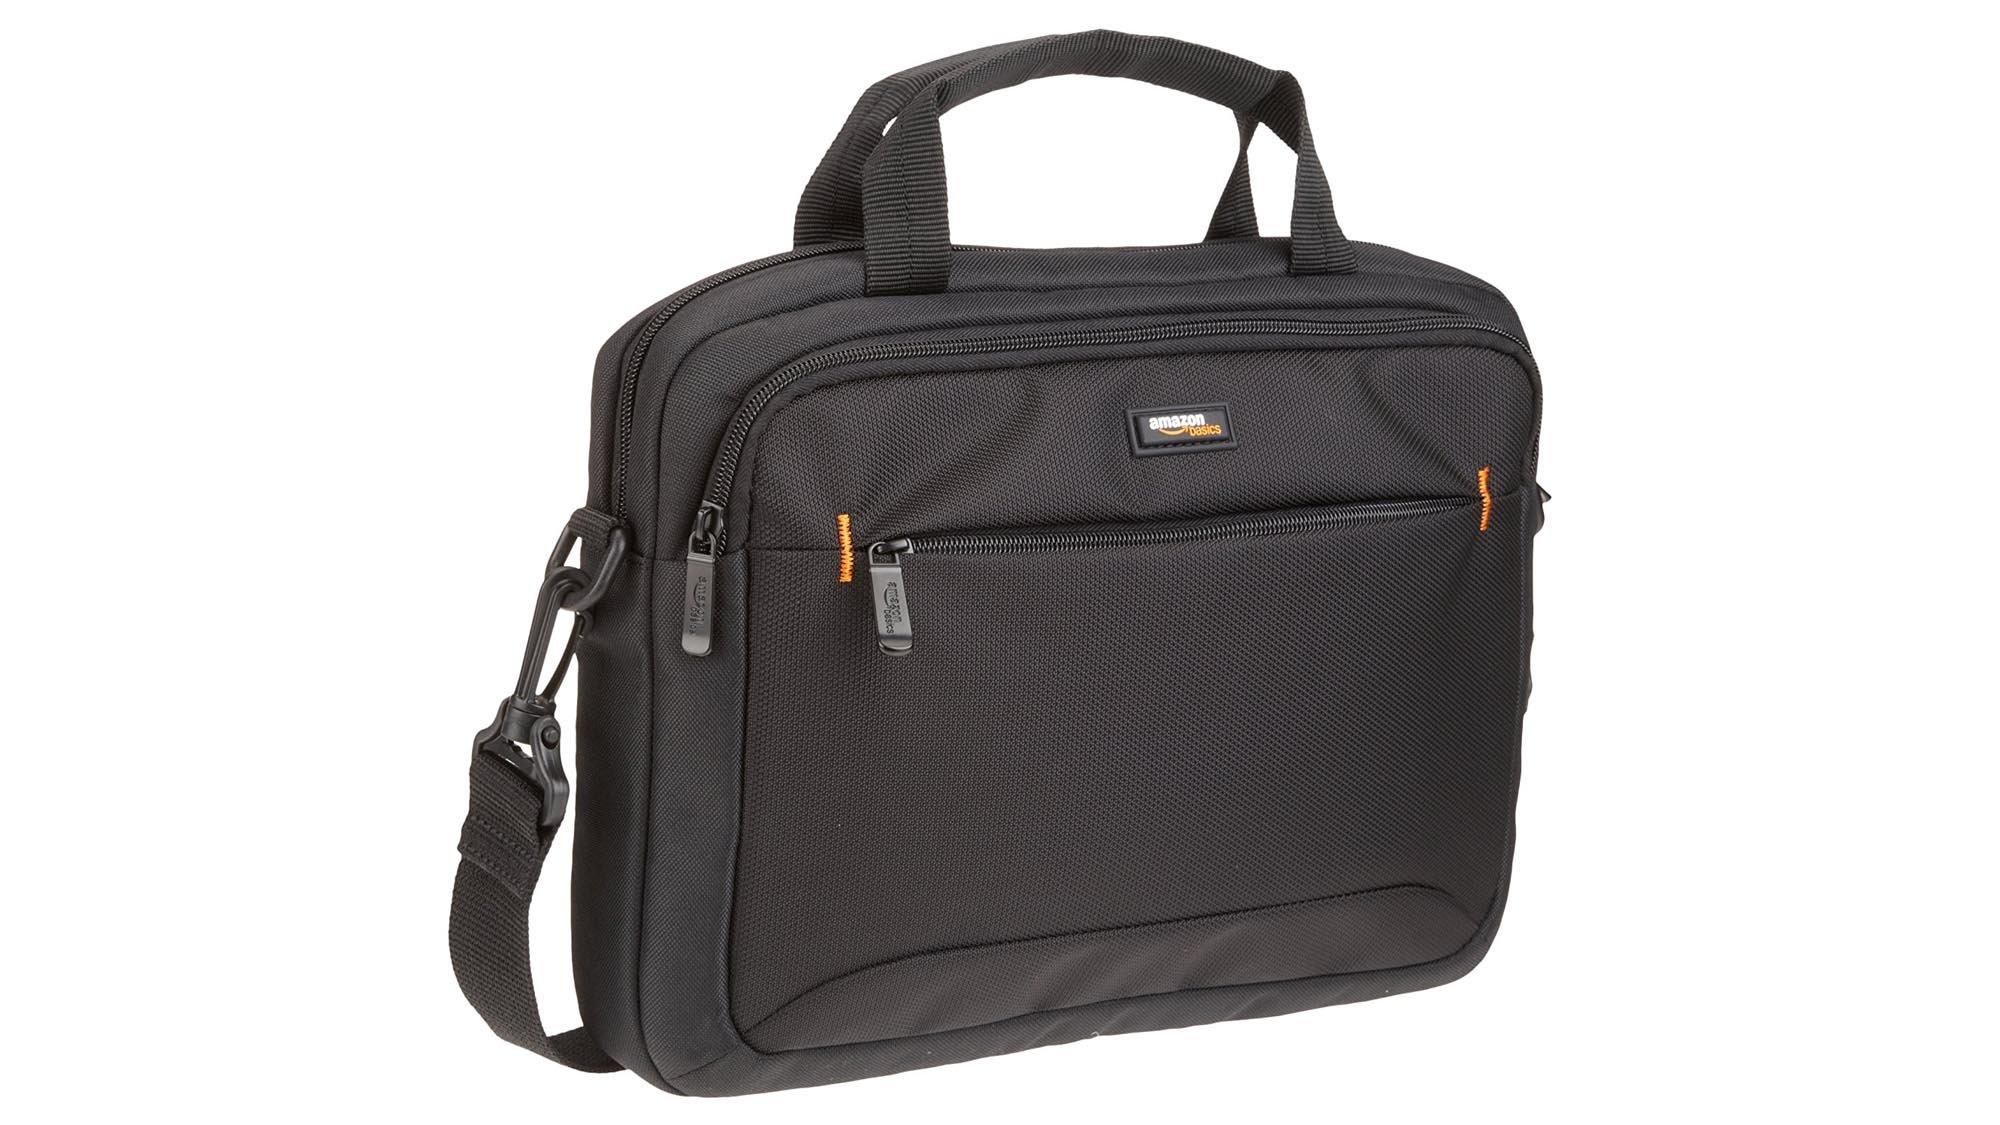 Men's Bags Generous 2017 Designer Men Backpacks Leather Rucksack School Bag Fashion Big Size Travel Backpack Bags Brown Laptop Backpack With Traditional Methods Luggage & Bags